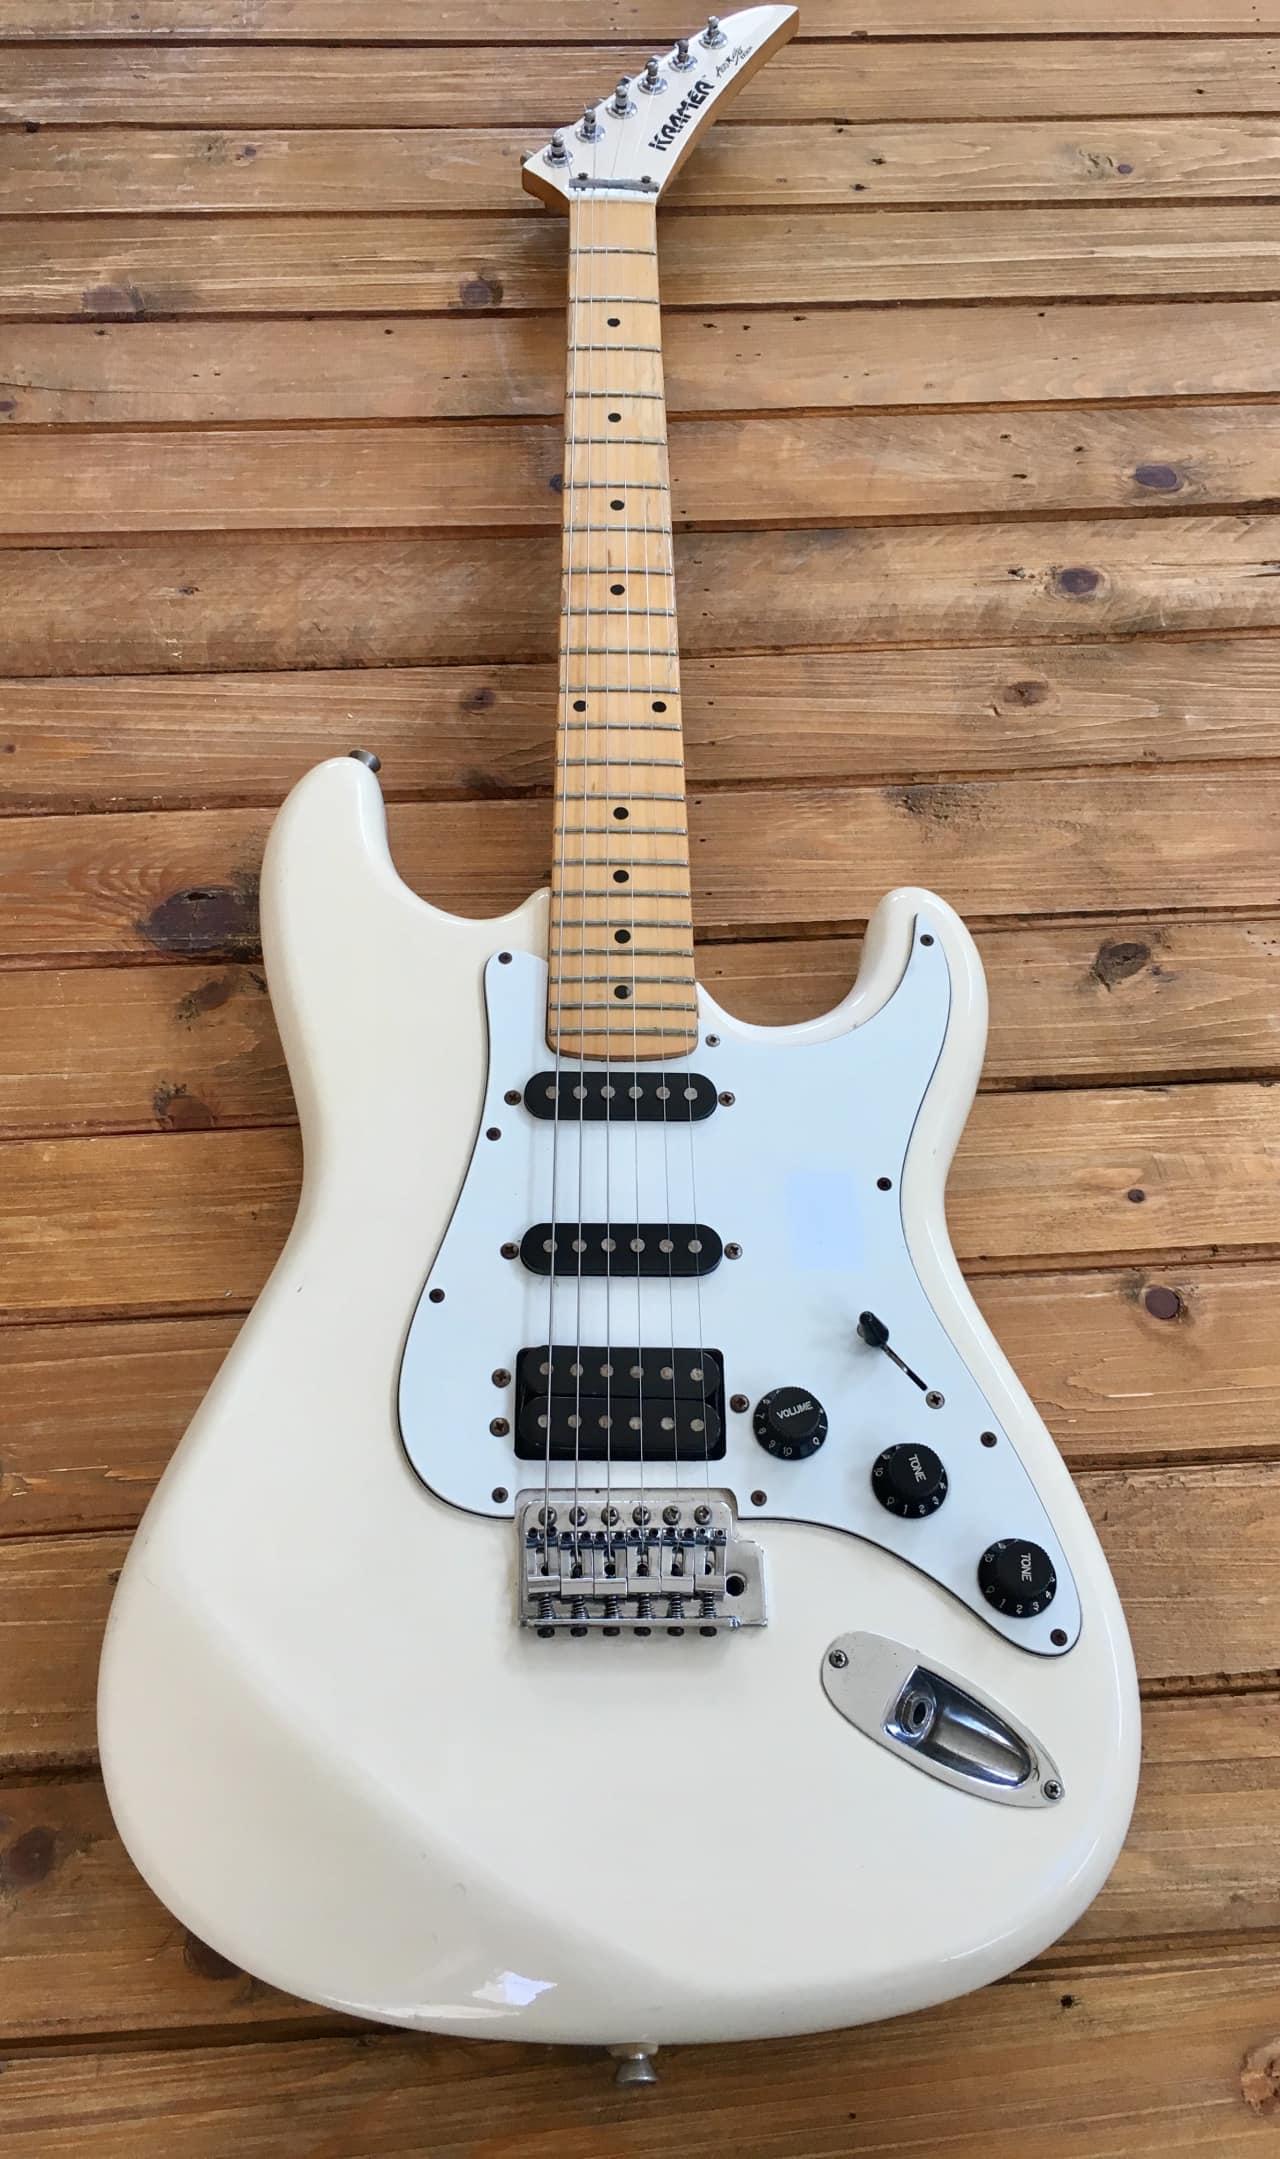 kramer zx30h guitar 1987 cream maple neck all original reverb. Black Bedroom Furniture Sets. Home Design Ideas